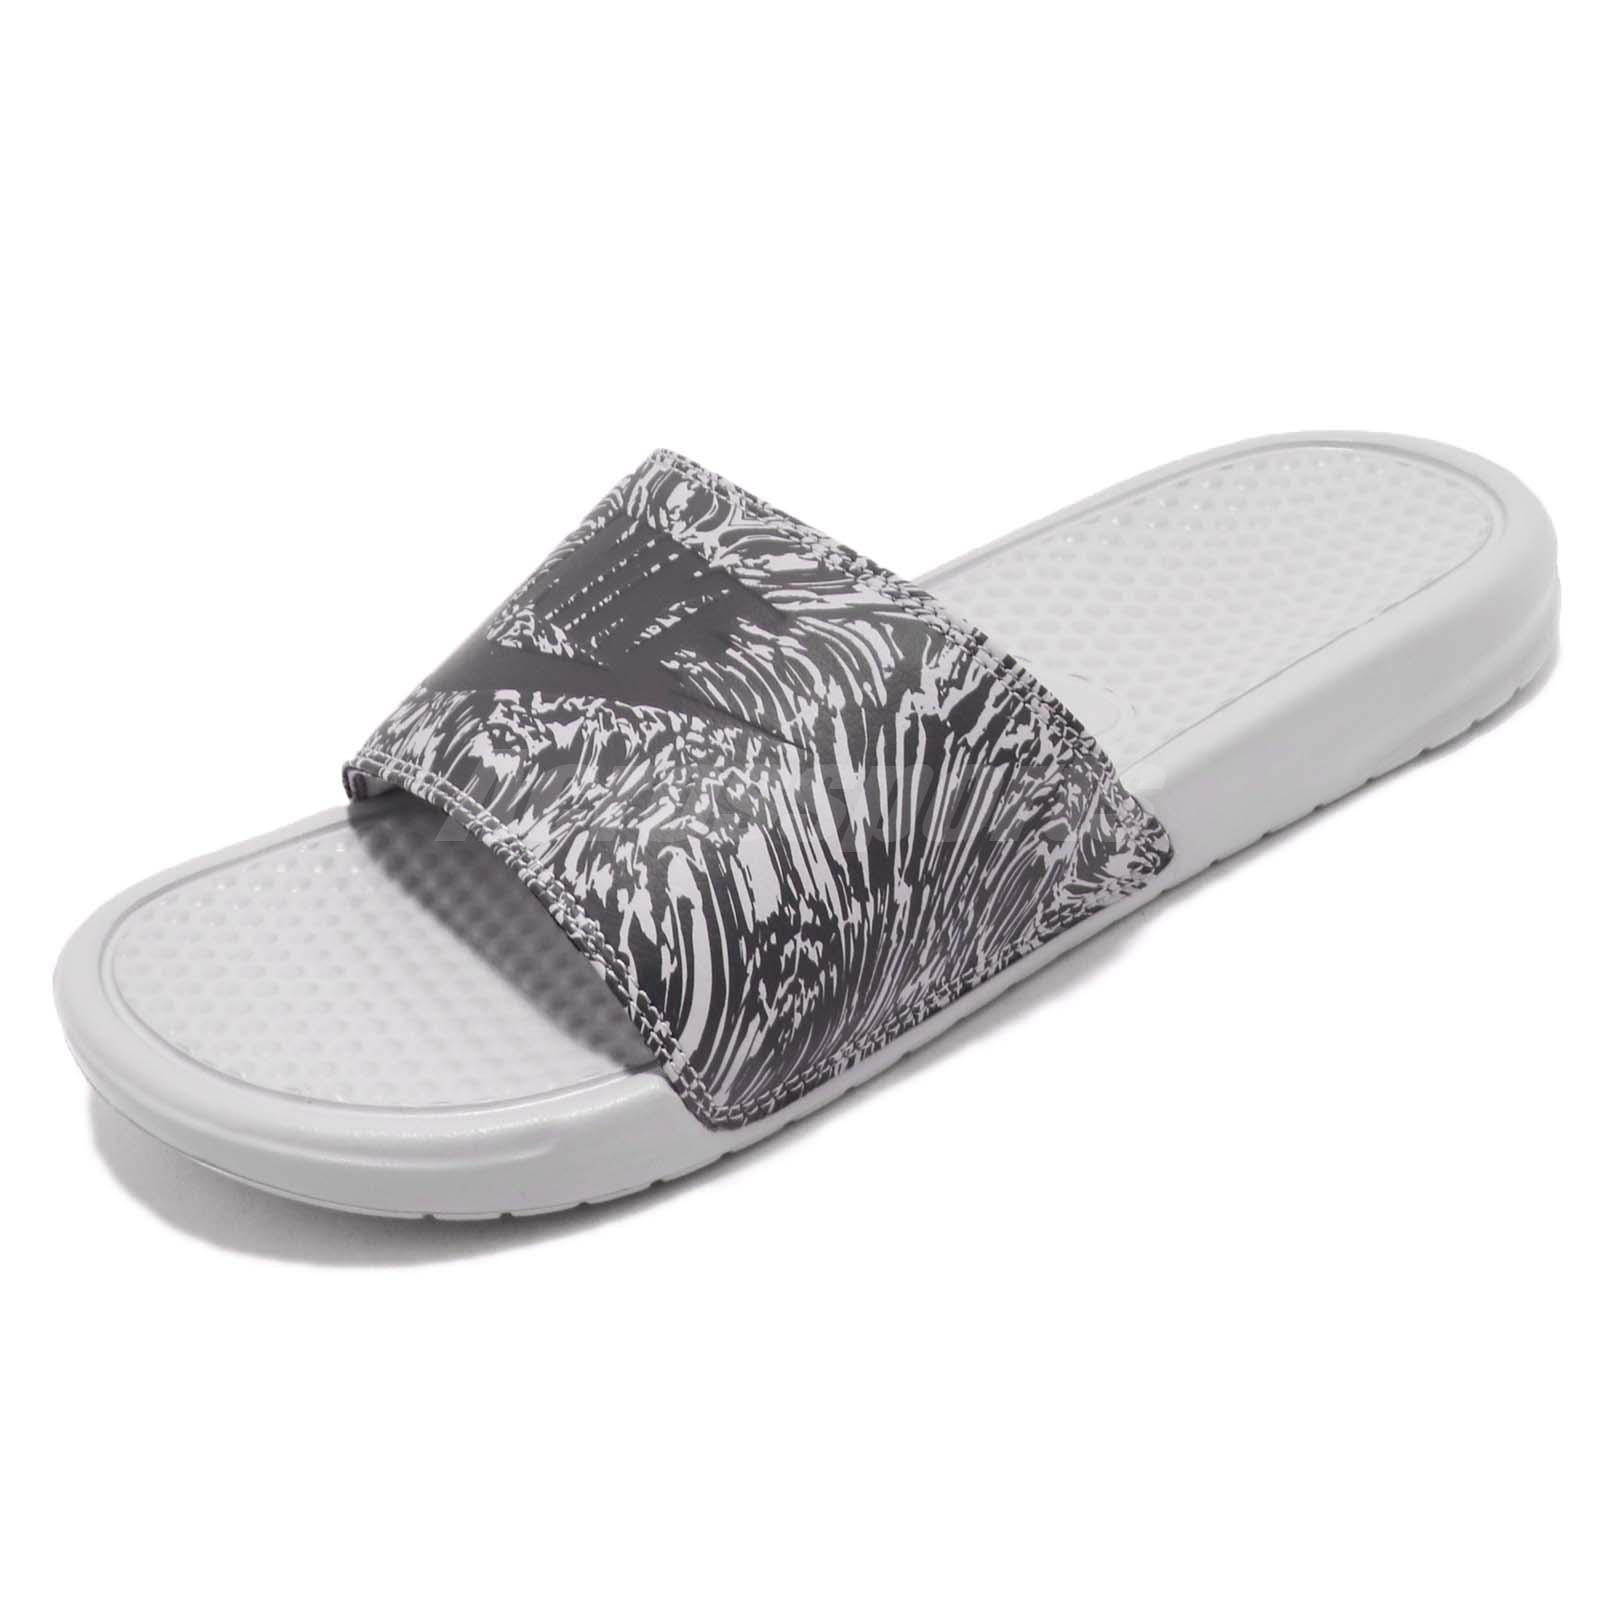 9fbbd8dcc328 Nike Benassi JDI Print Grey Anthracite Men Sports Sandals Slides 631261-005